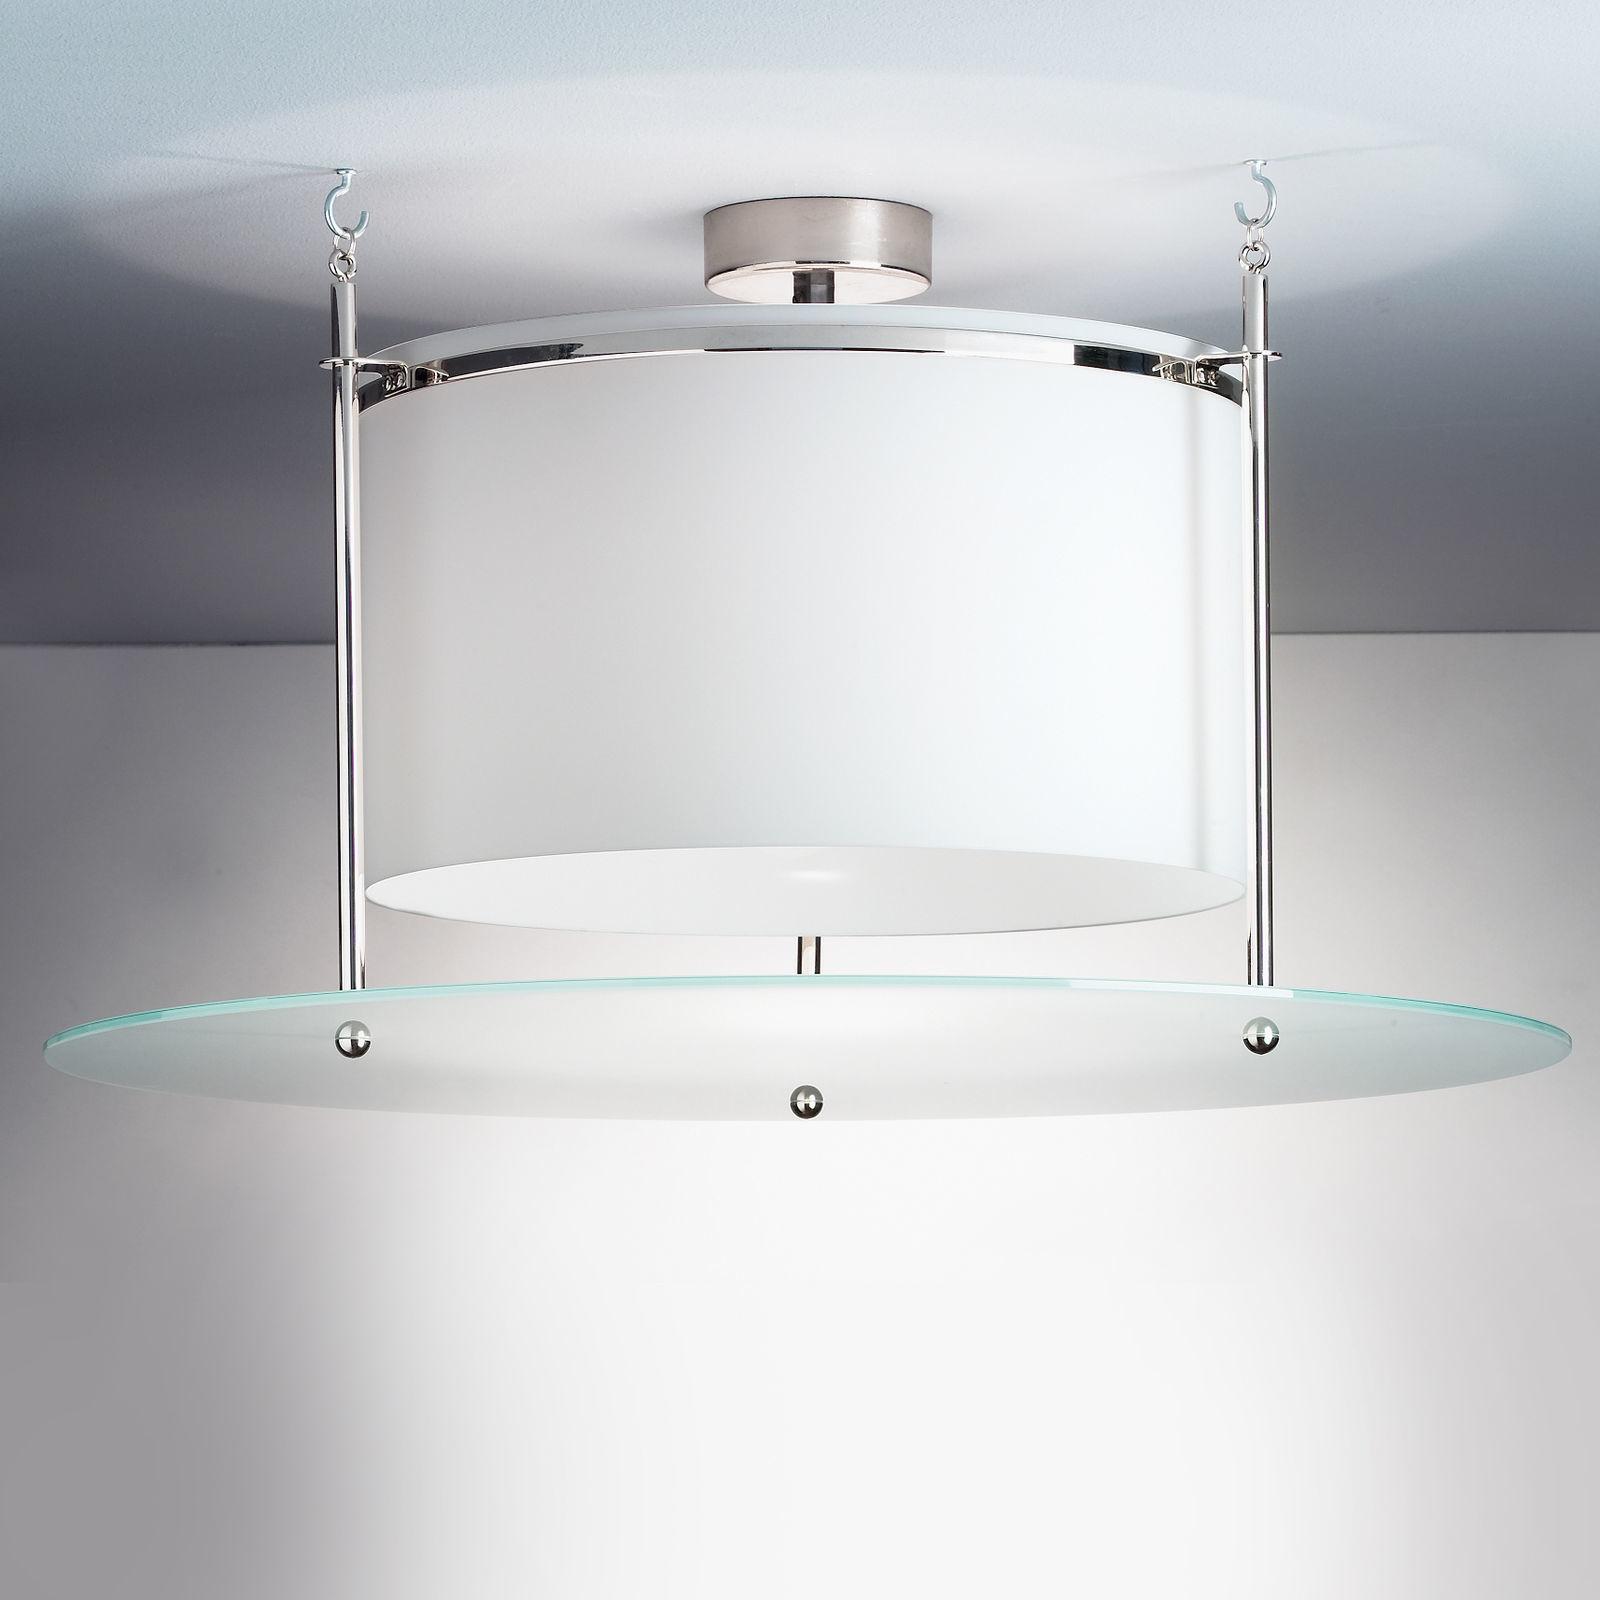 dmb30 deckenleuchte tecnolumen formost. Black Bedroom Furniture Sets. Home Design Ideas